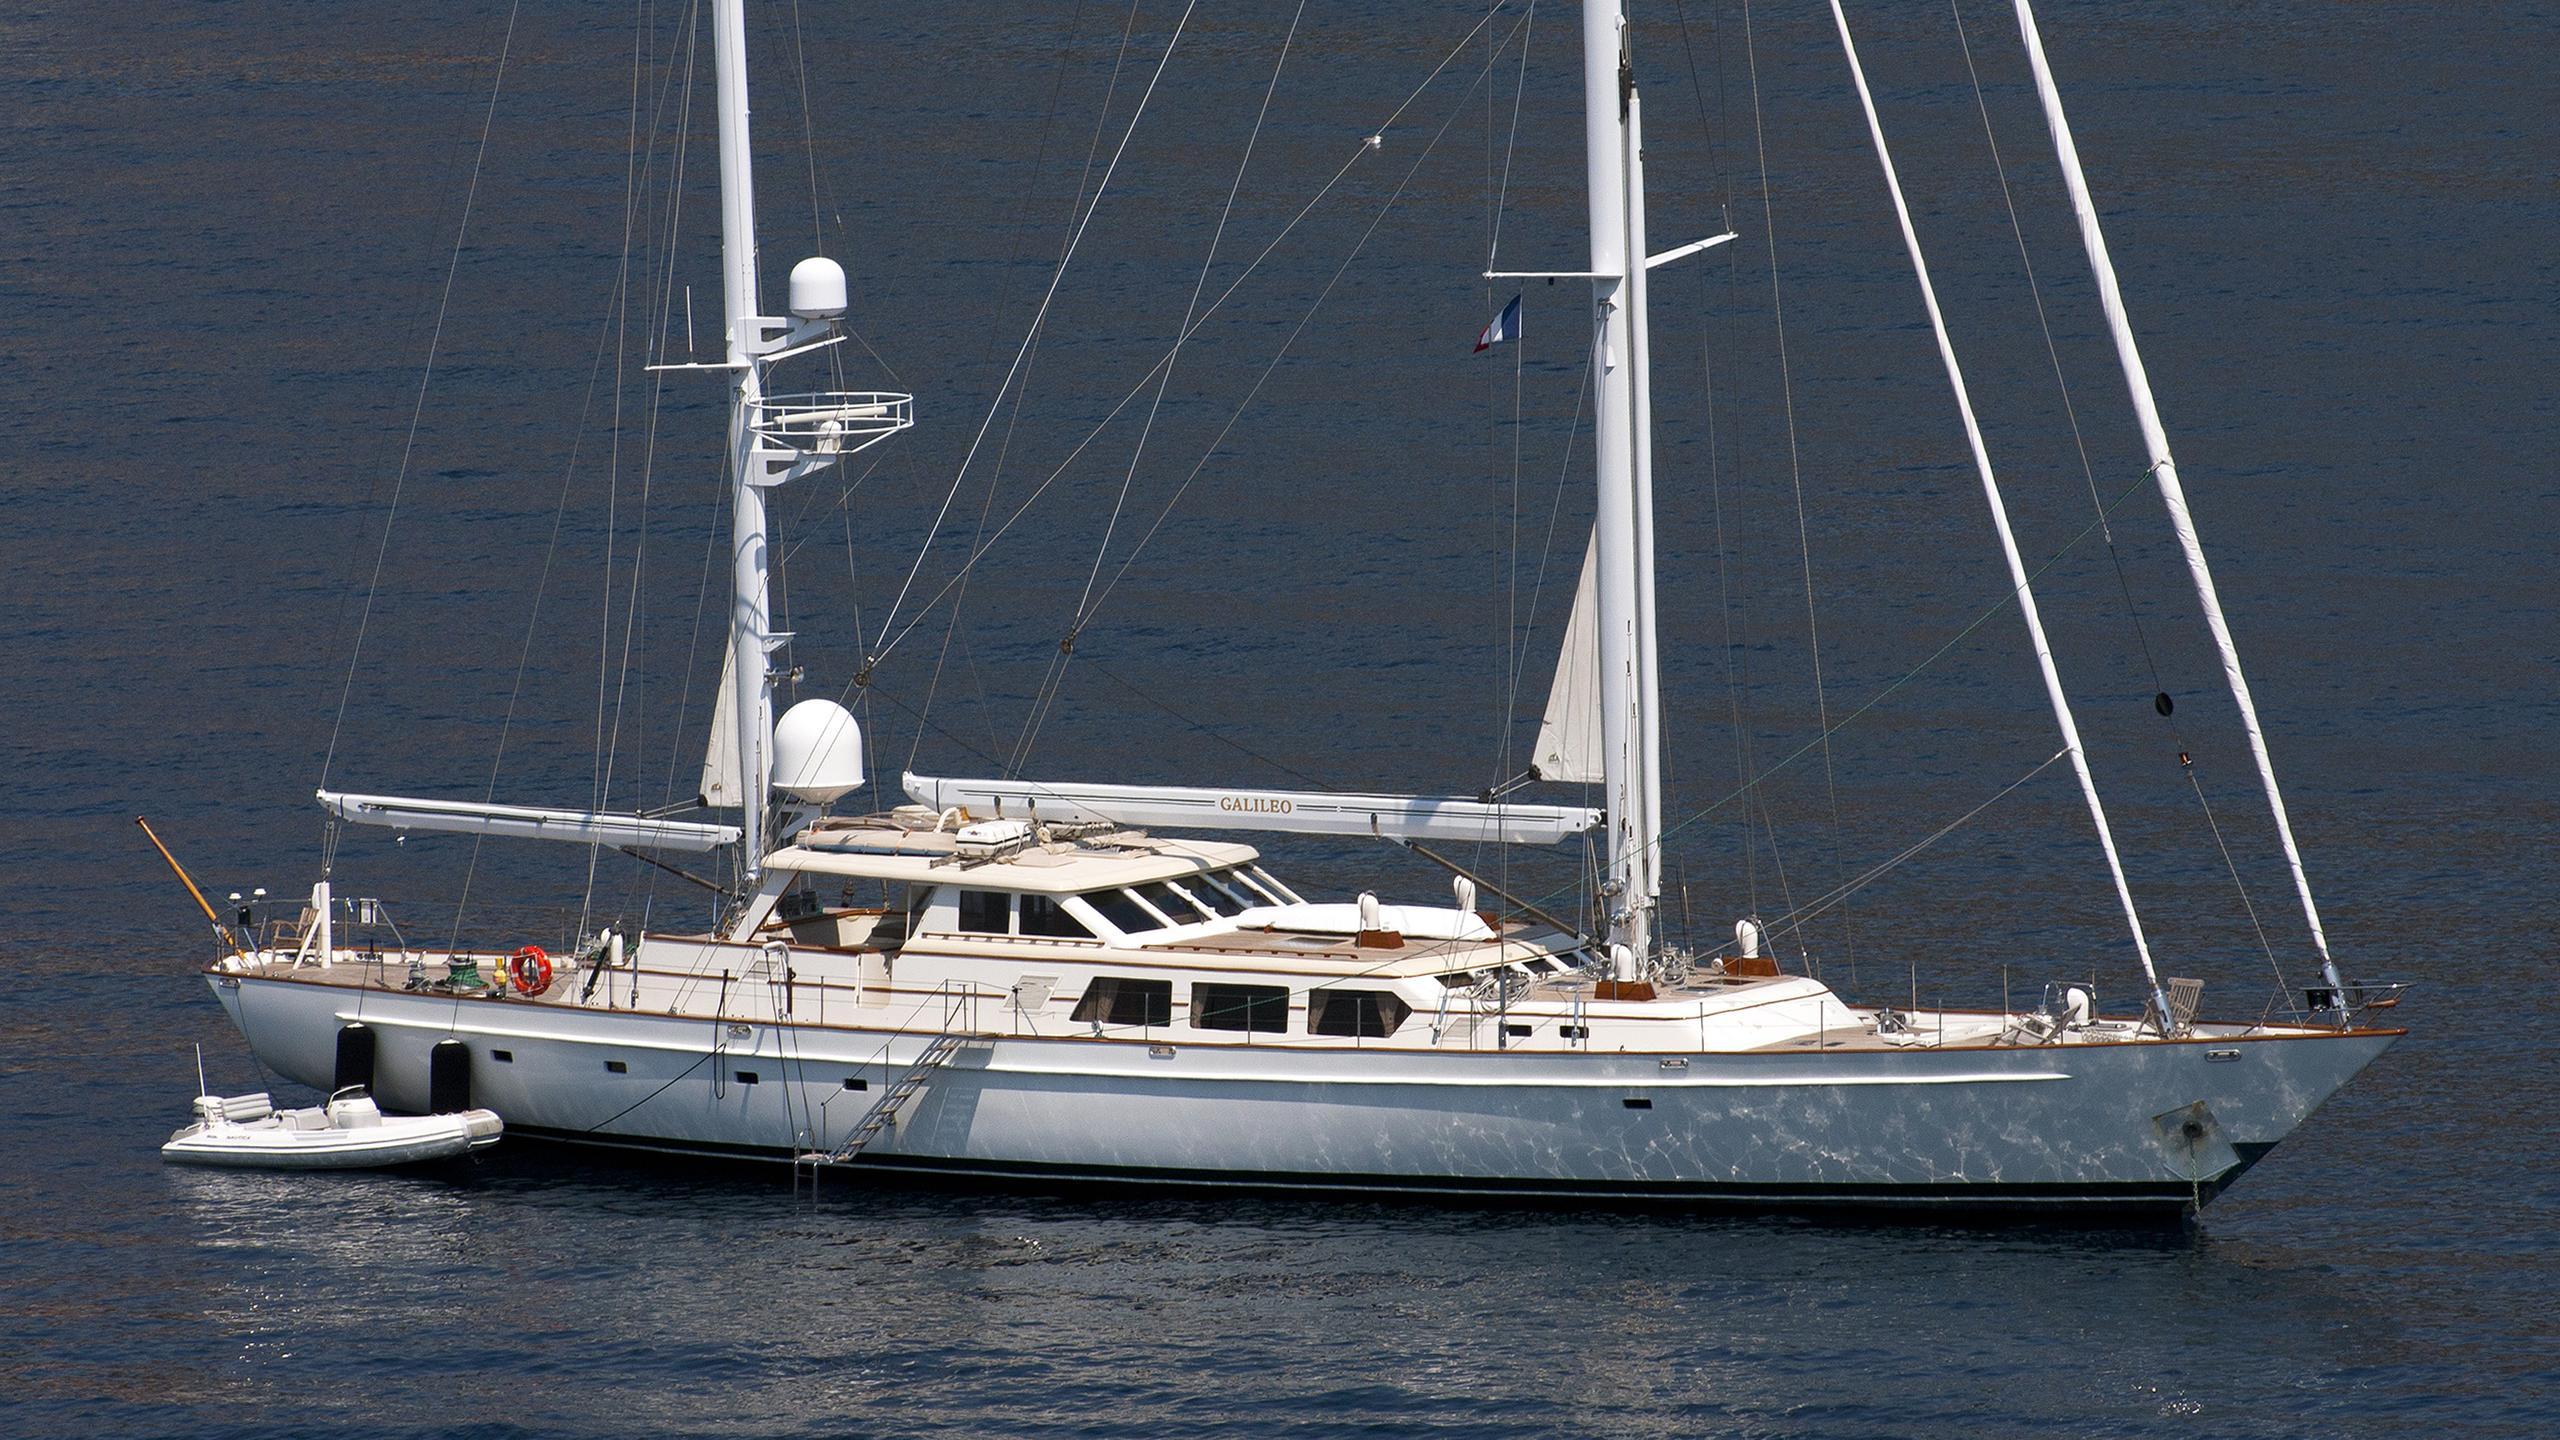 galileo-yacht-exterior